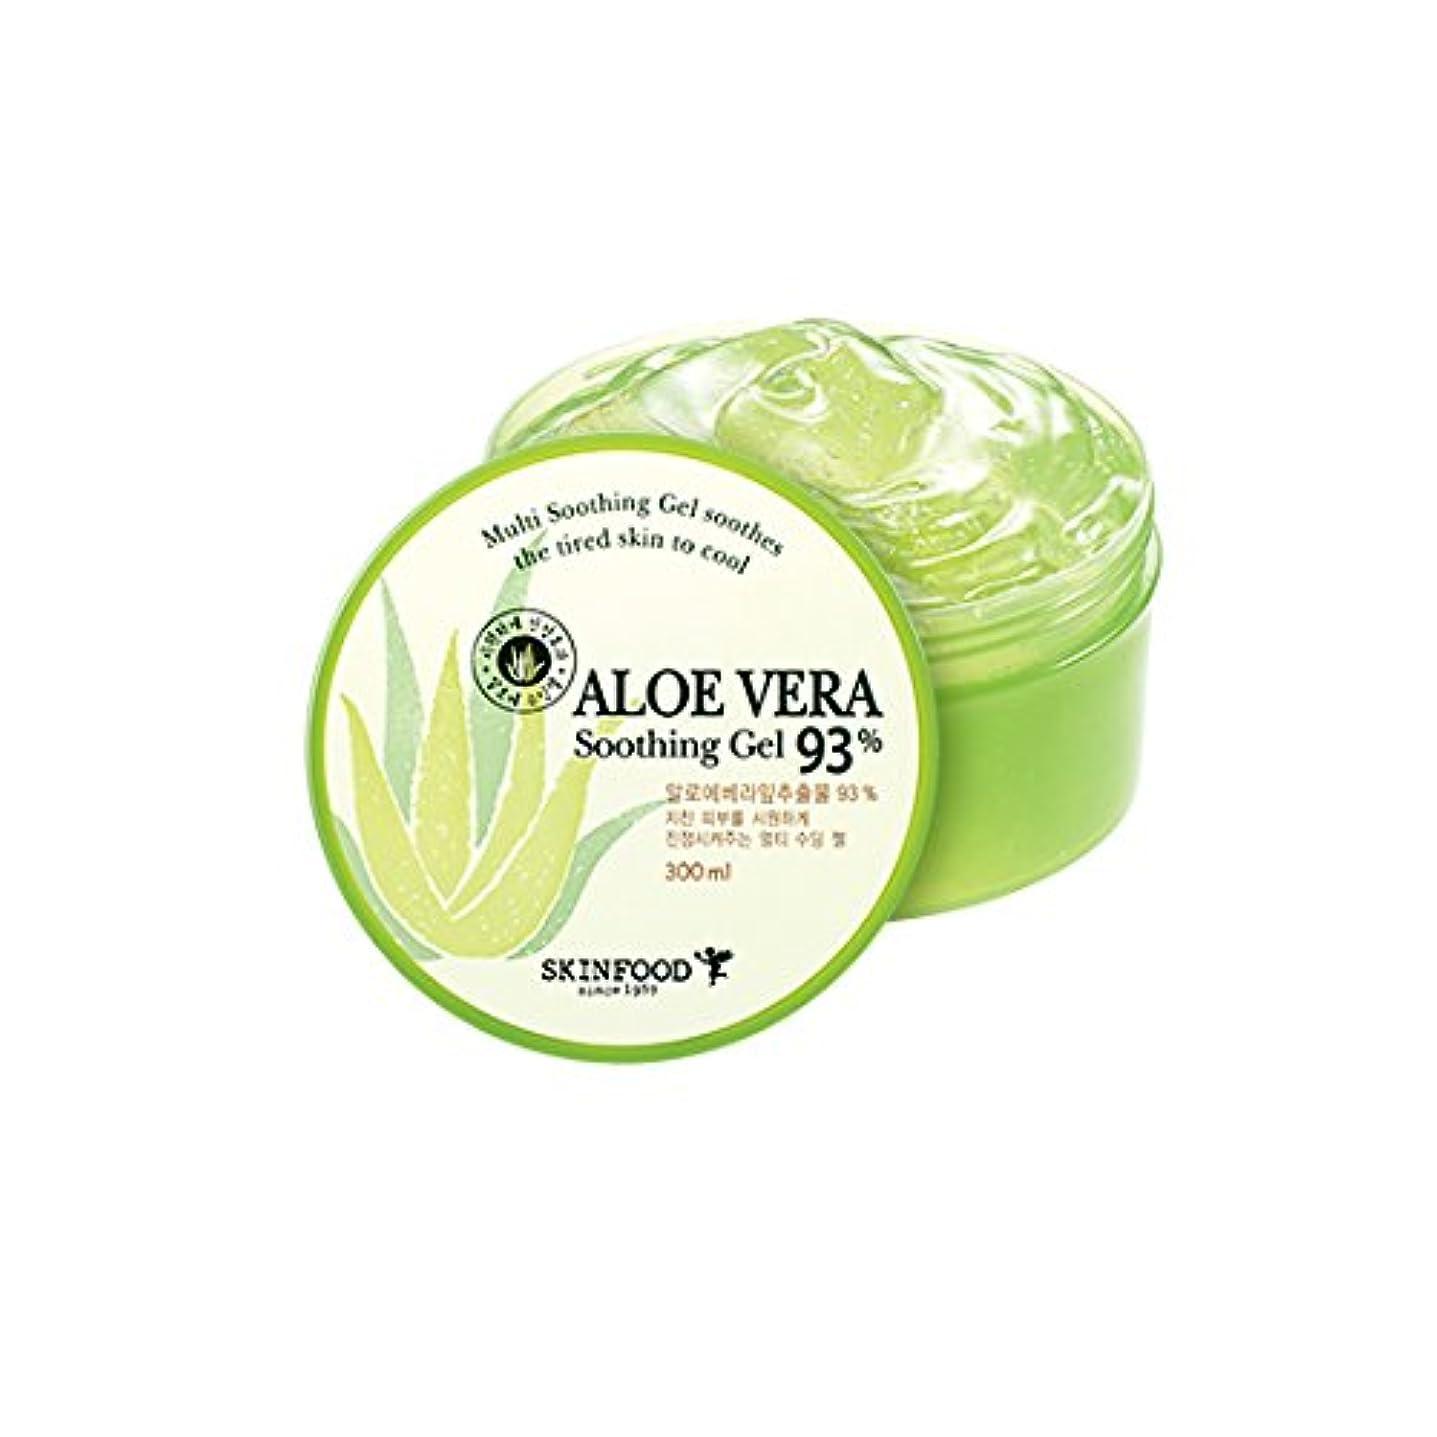 Skinfood アロエベラ93%スージングジェル/Aloe Vera 93% Soothing Gel 300ml [並行輸入品]